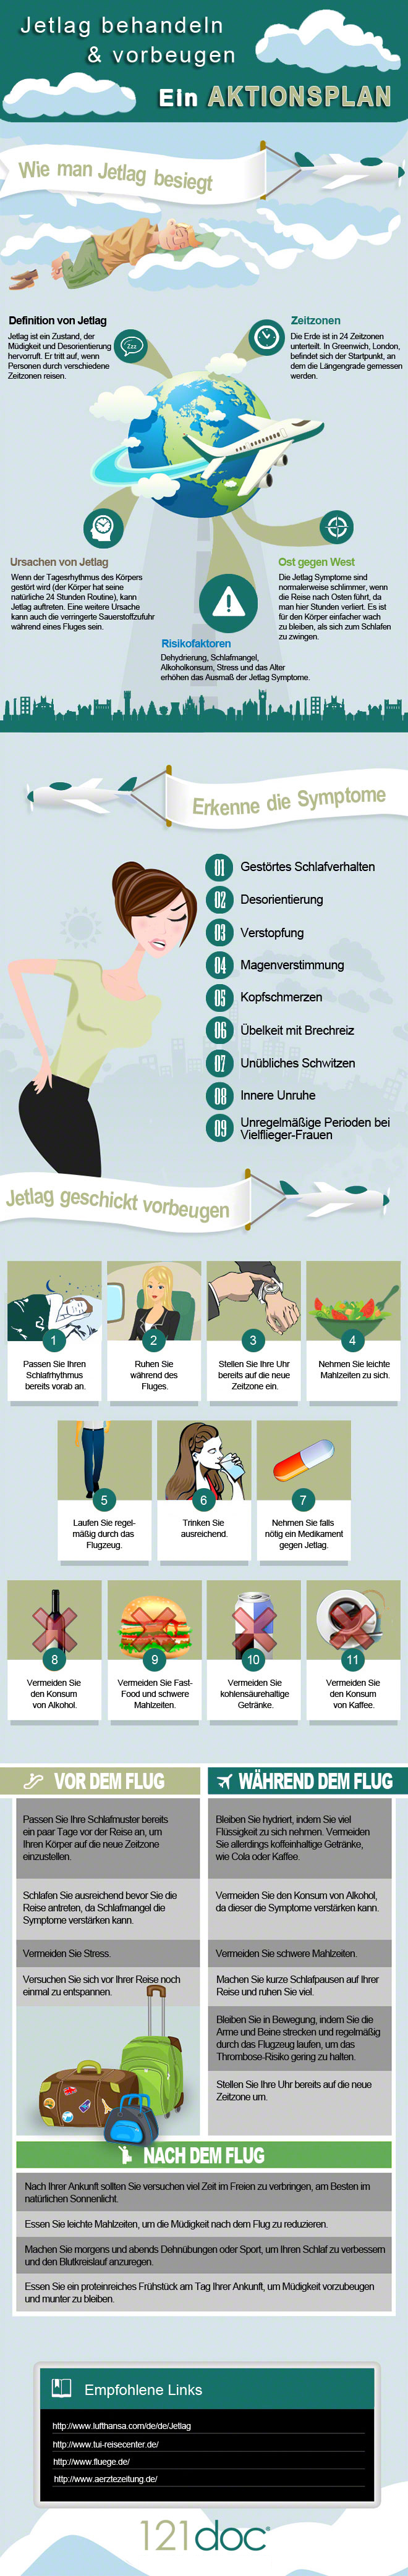 infographic-jetlag_121